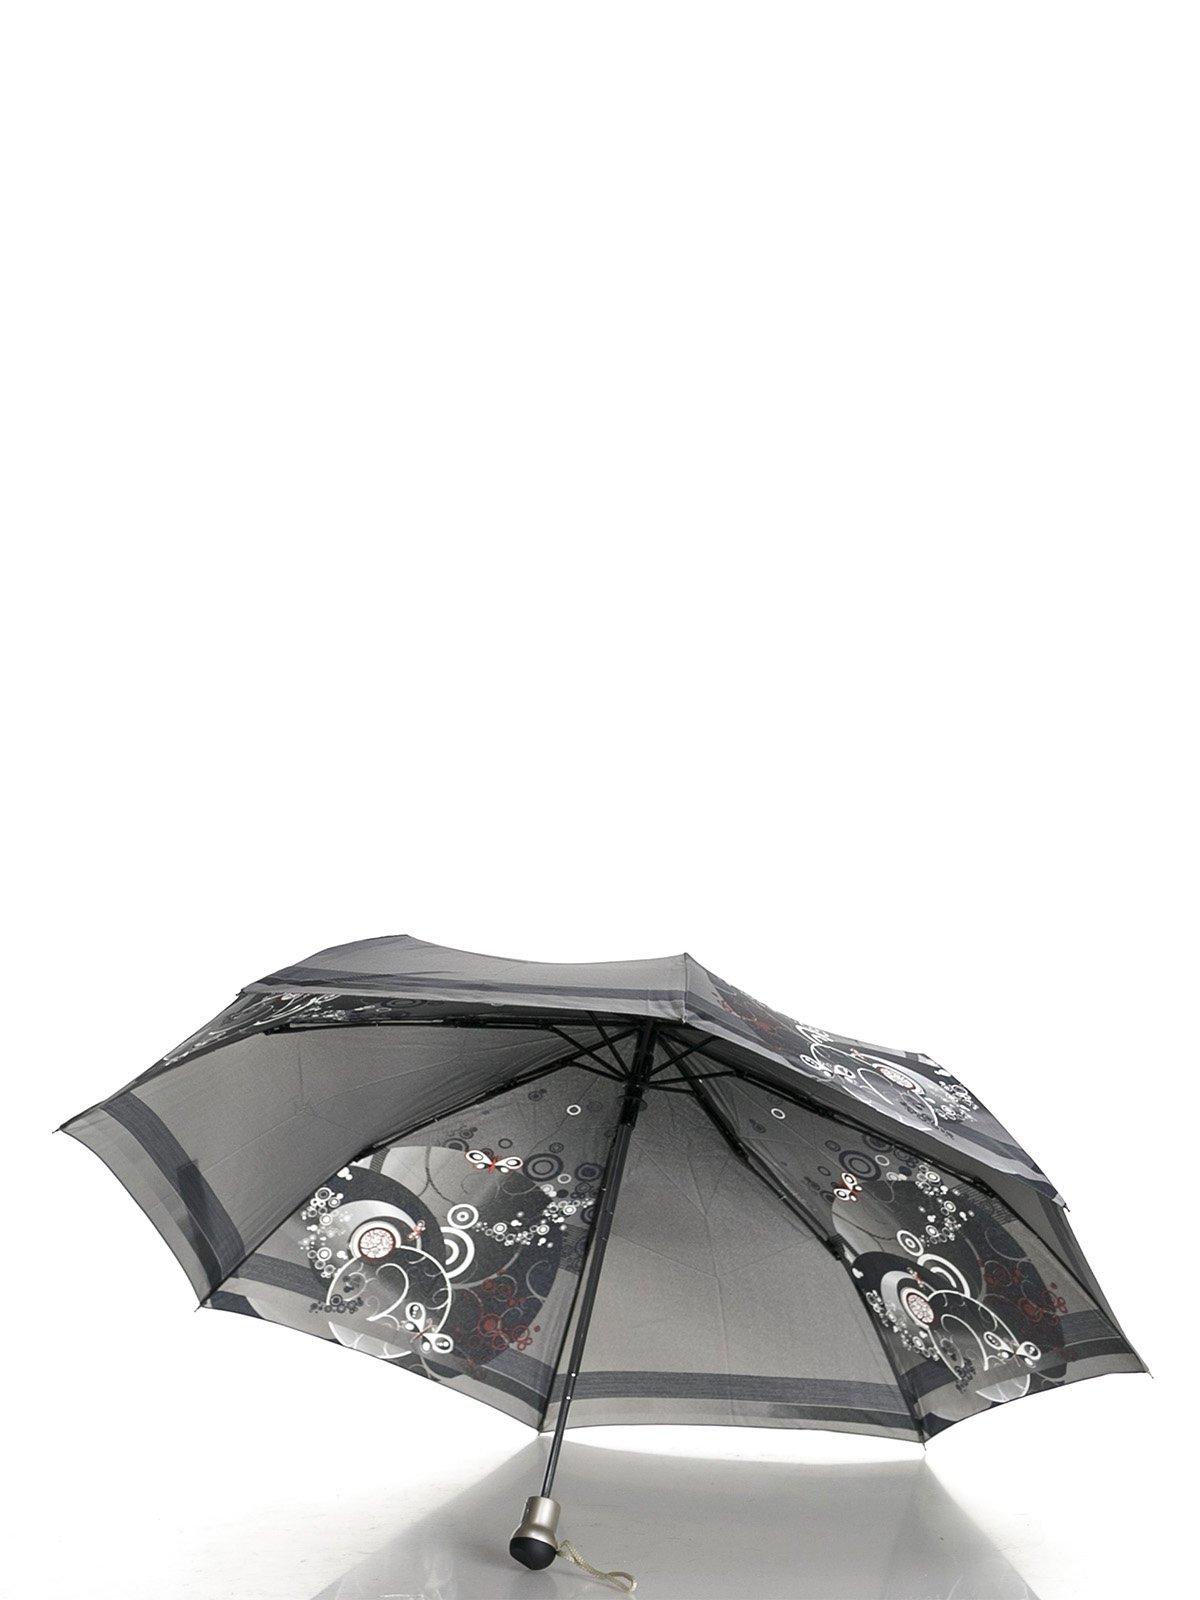 Зонт-полуавтомат | 968773 | фото 2